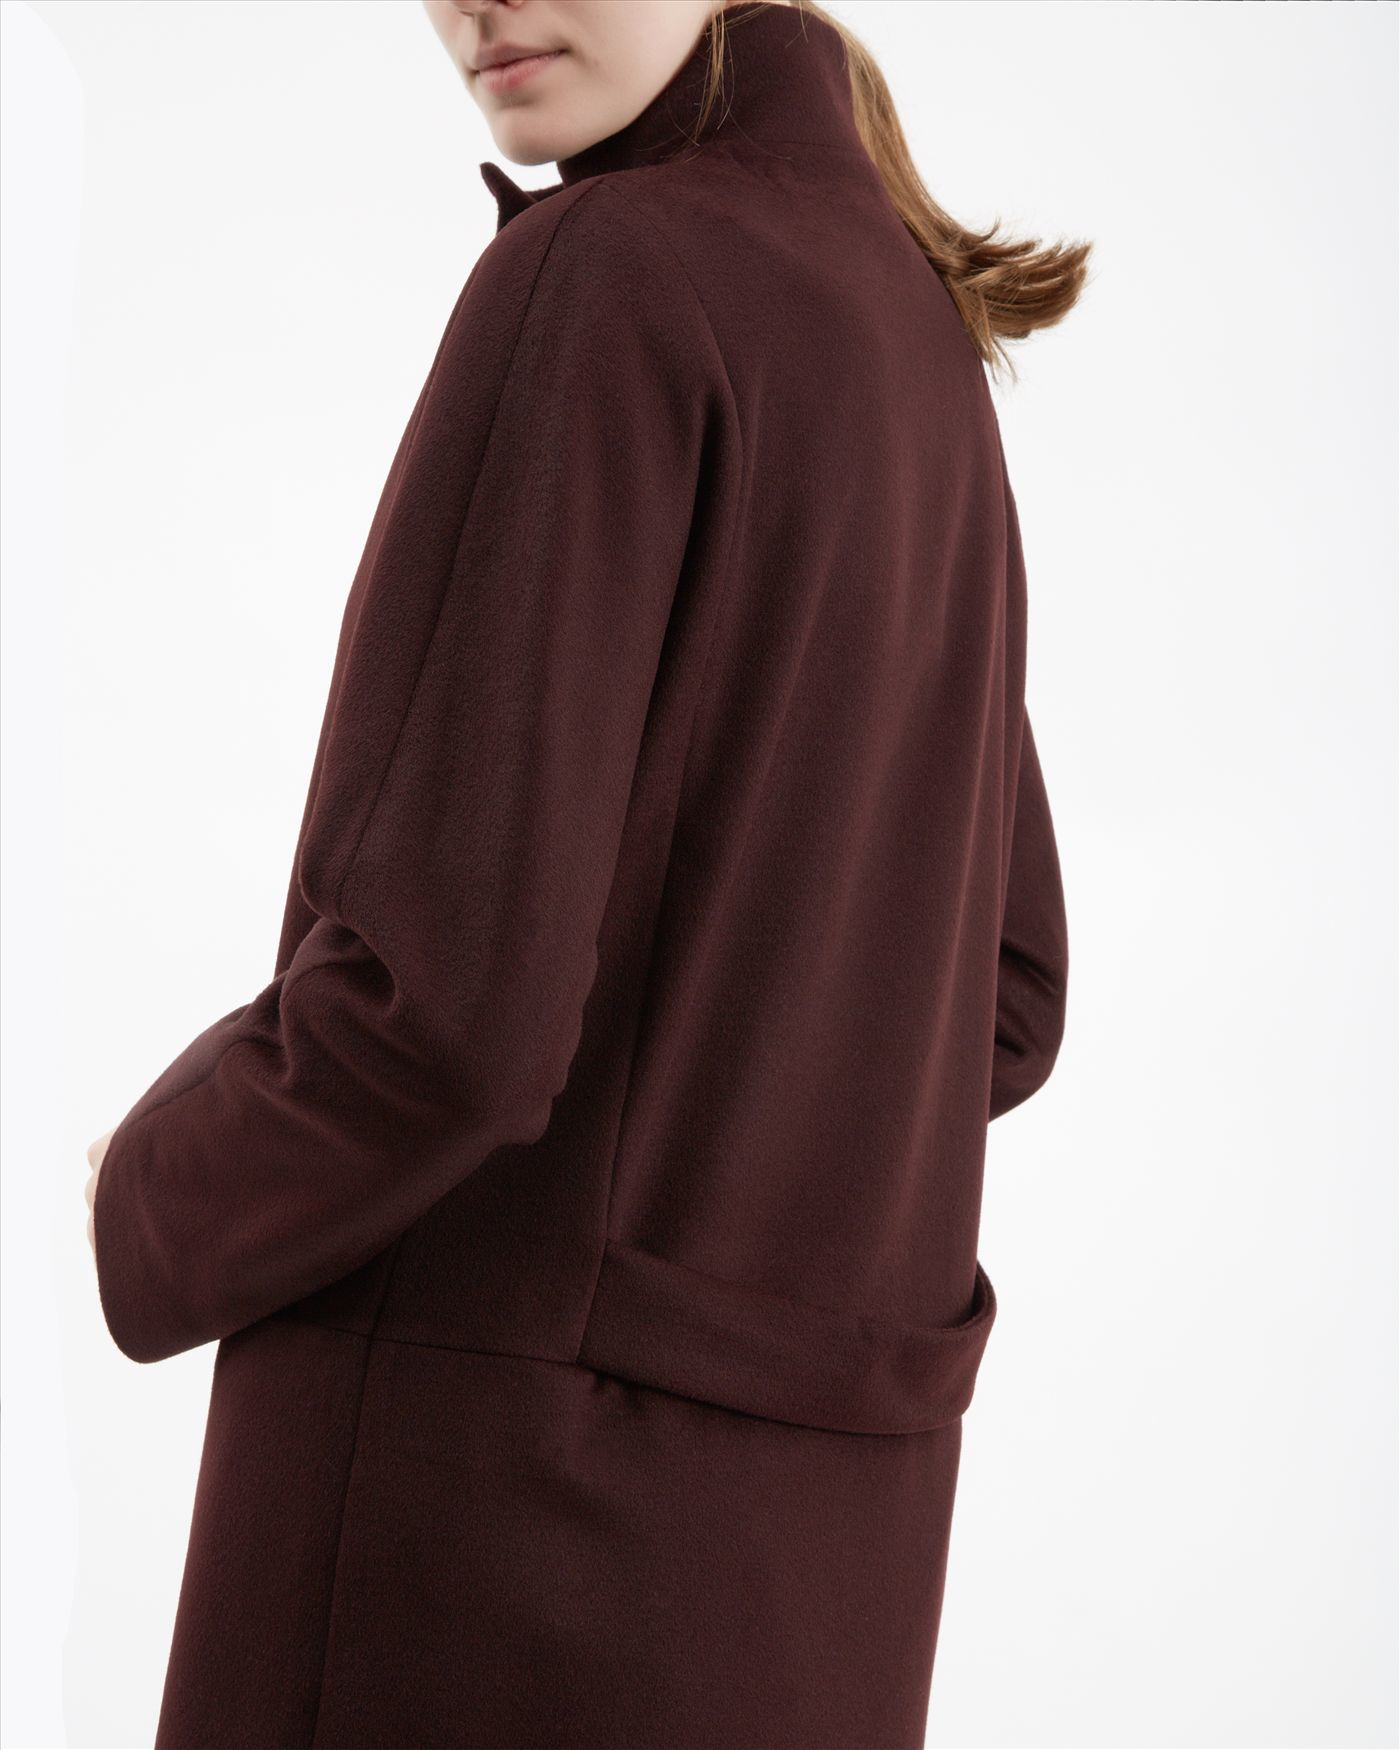 Jaeger Wool Funnel Neck Coat in Brown | Lyst